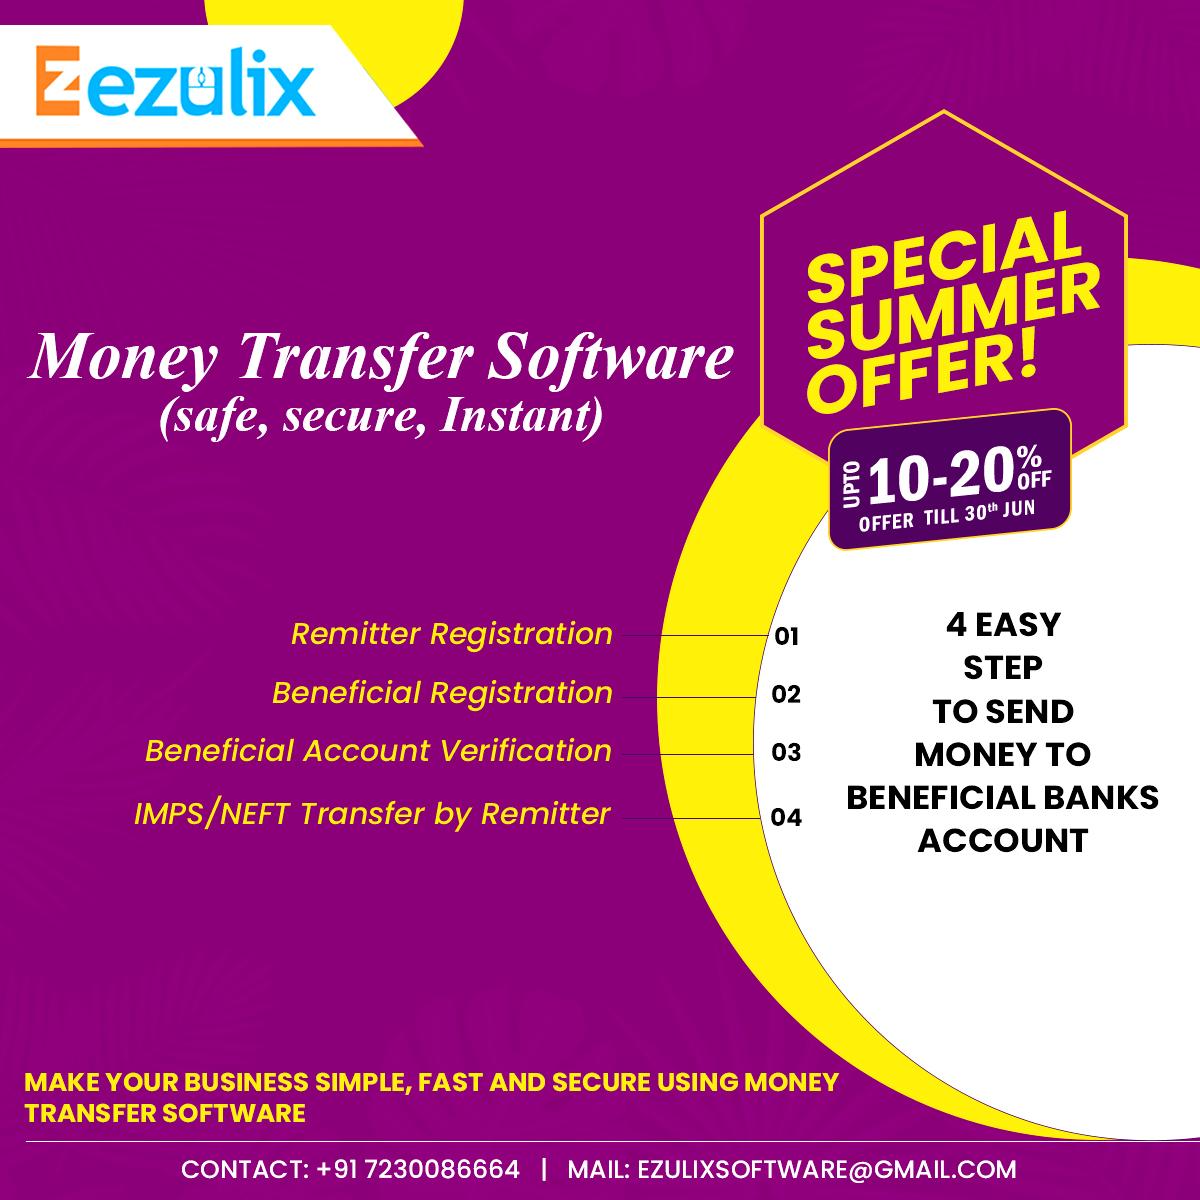 Ezulix - Web Design and Mobile App Development: money